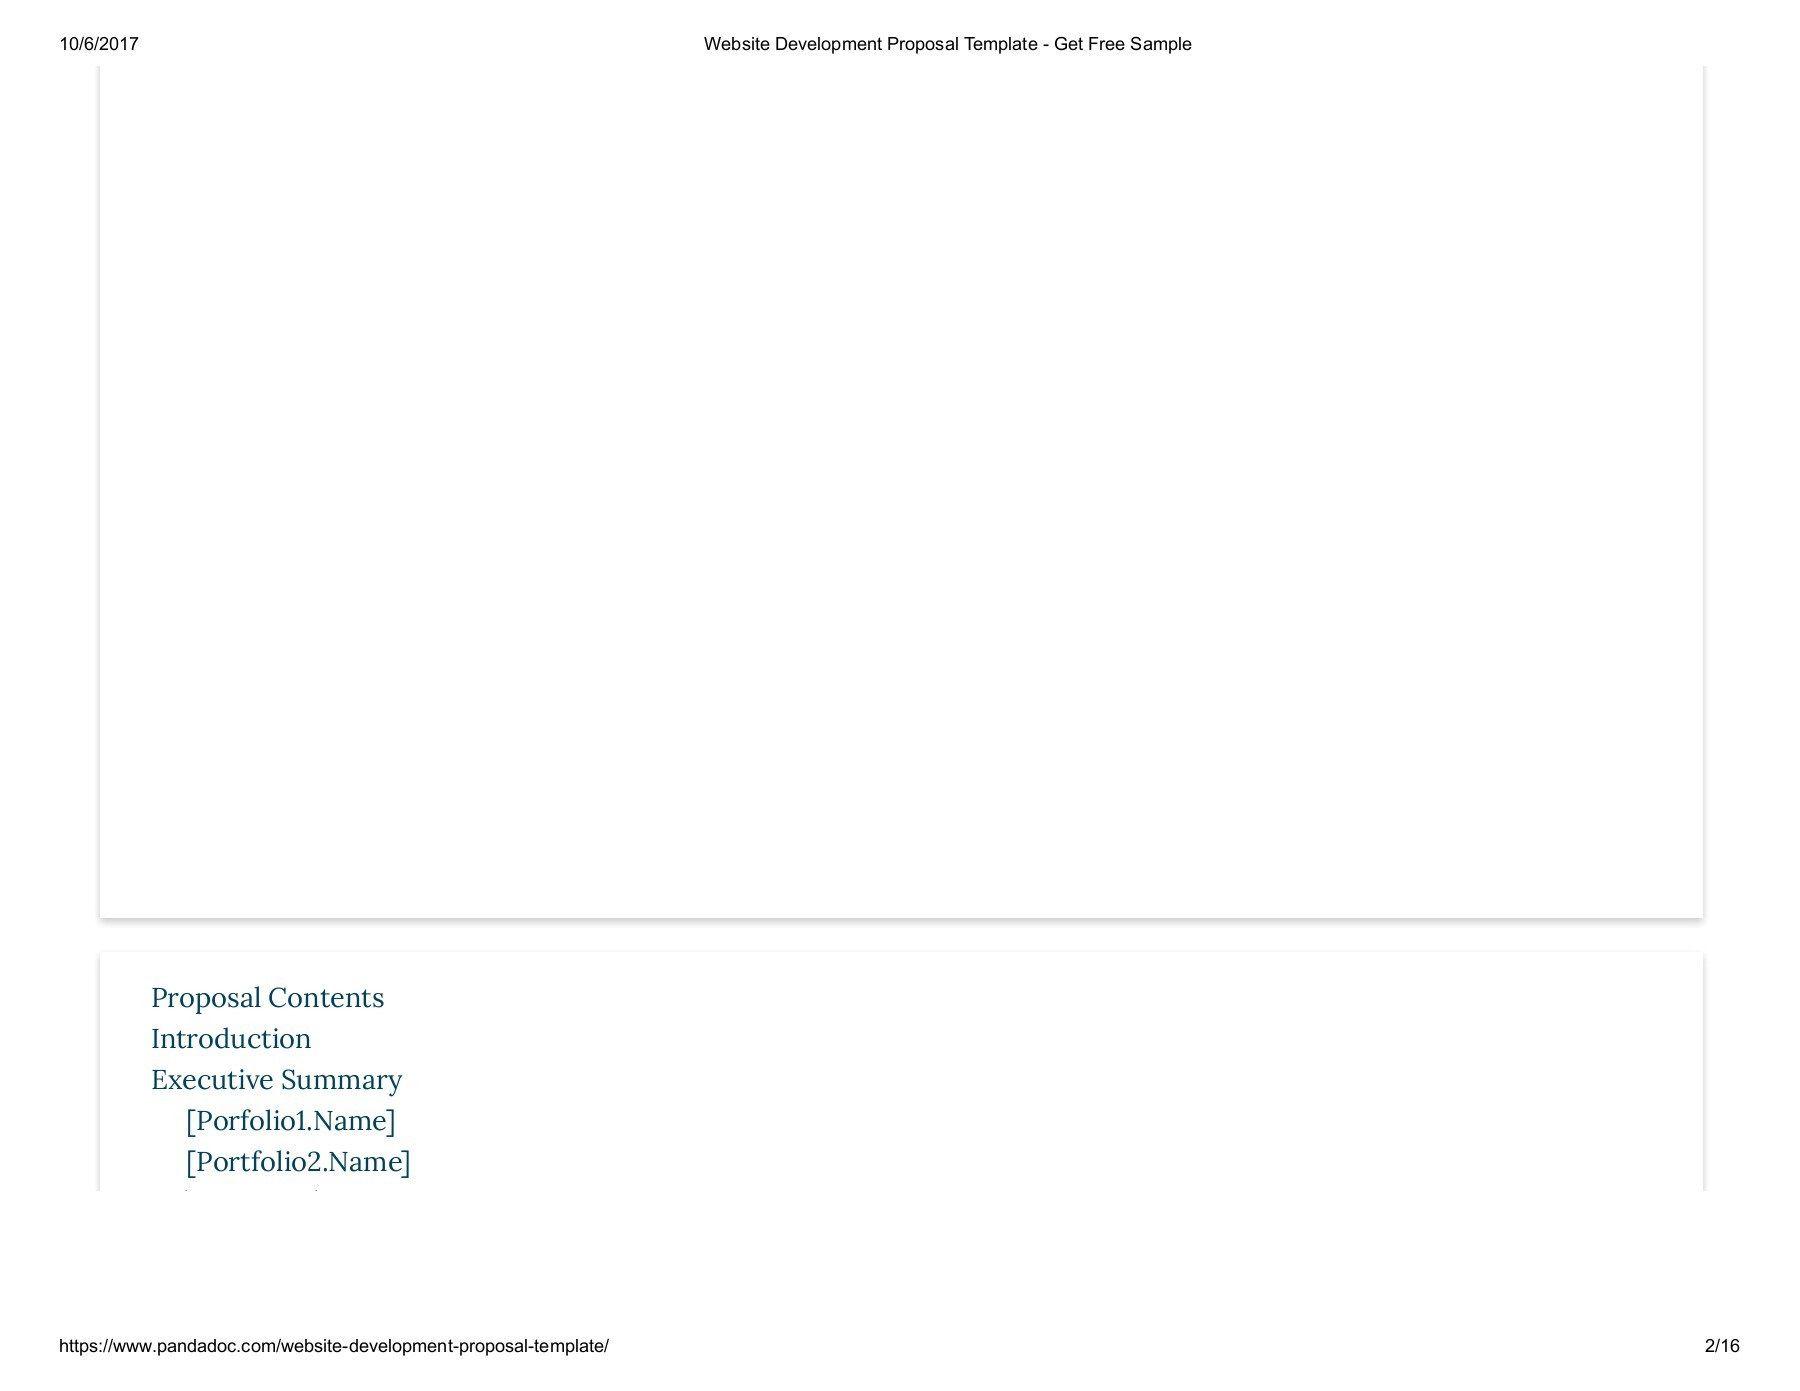 002 Fantastic Website Development Proposal Template Free Image  WordFull